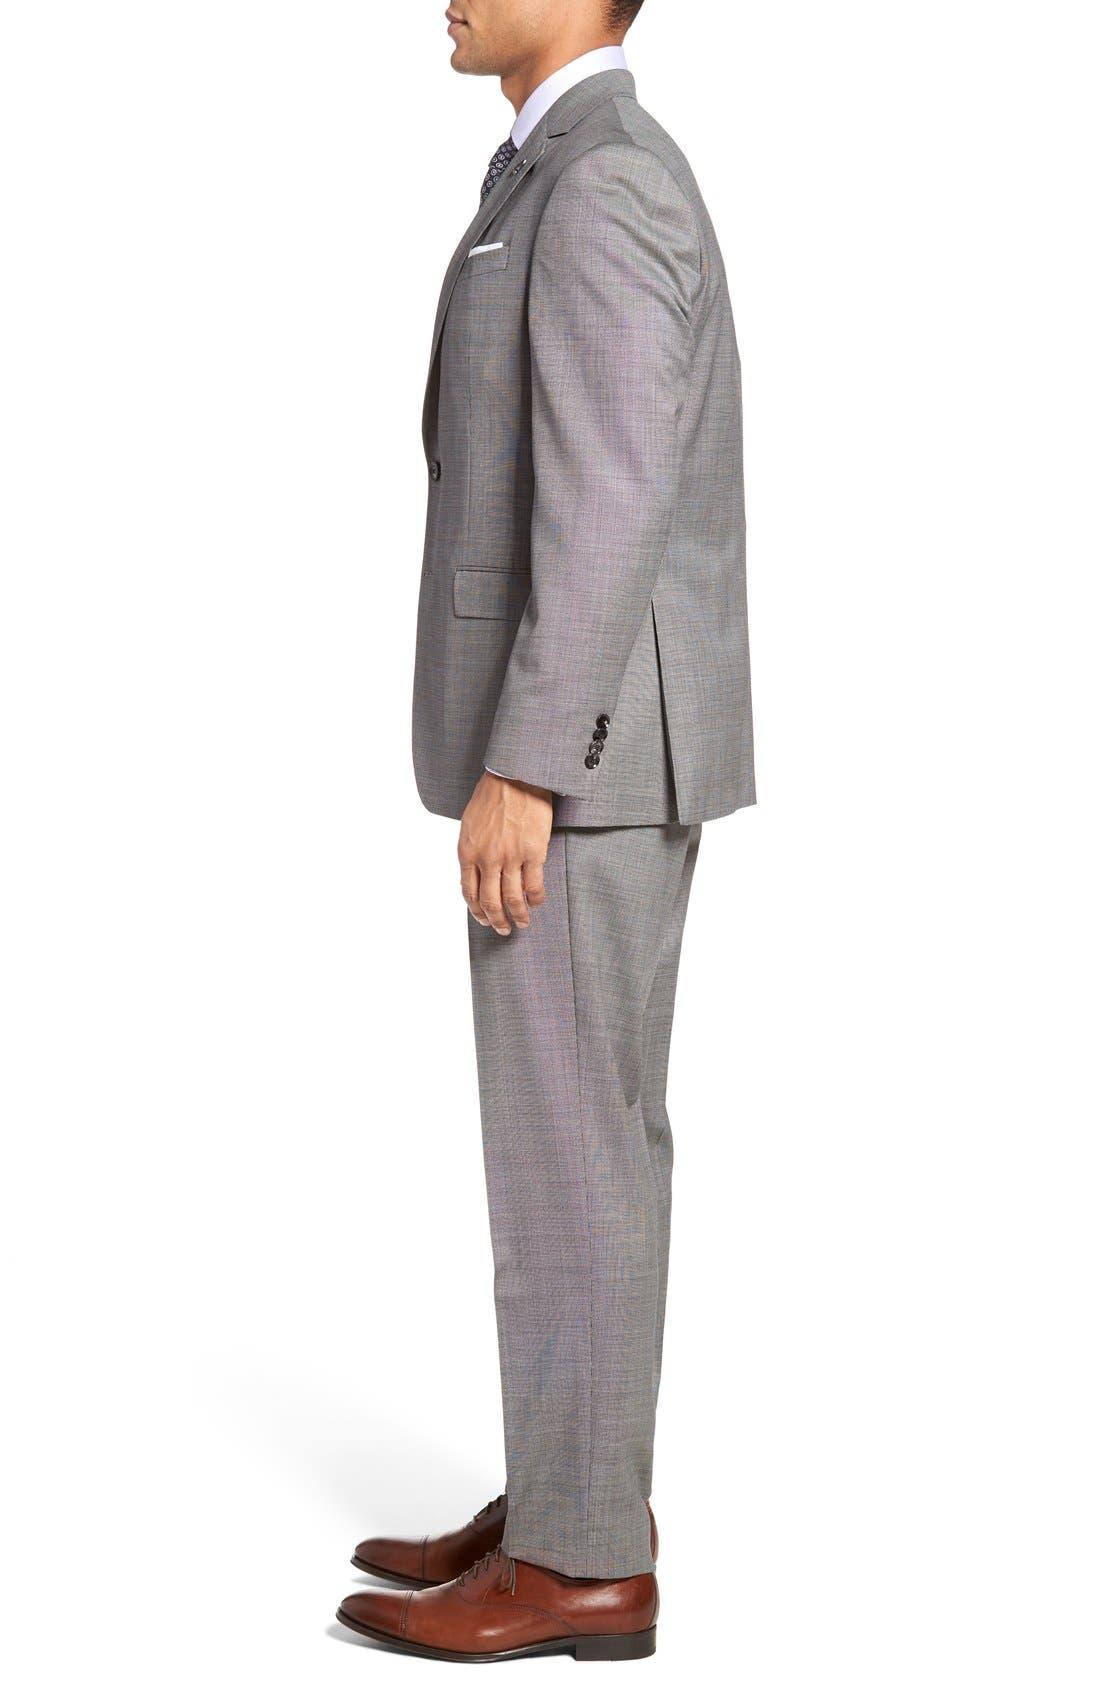 Jay Trim Fit Solid Wool Suit,                             Alternate thumbnail 8, color,                             LIGHT GREY